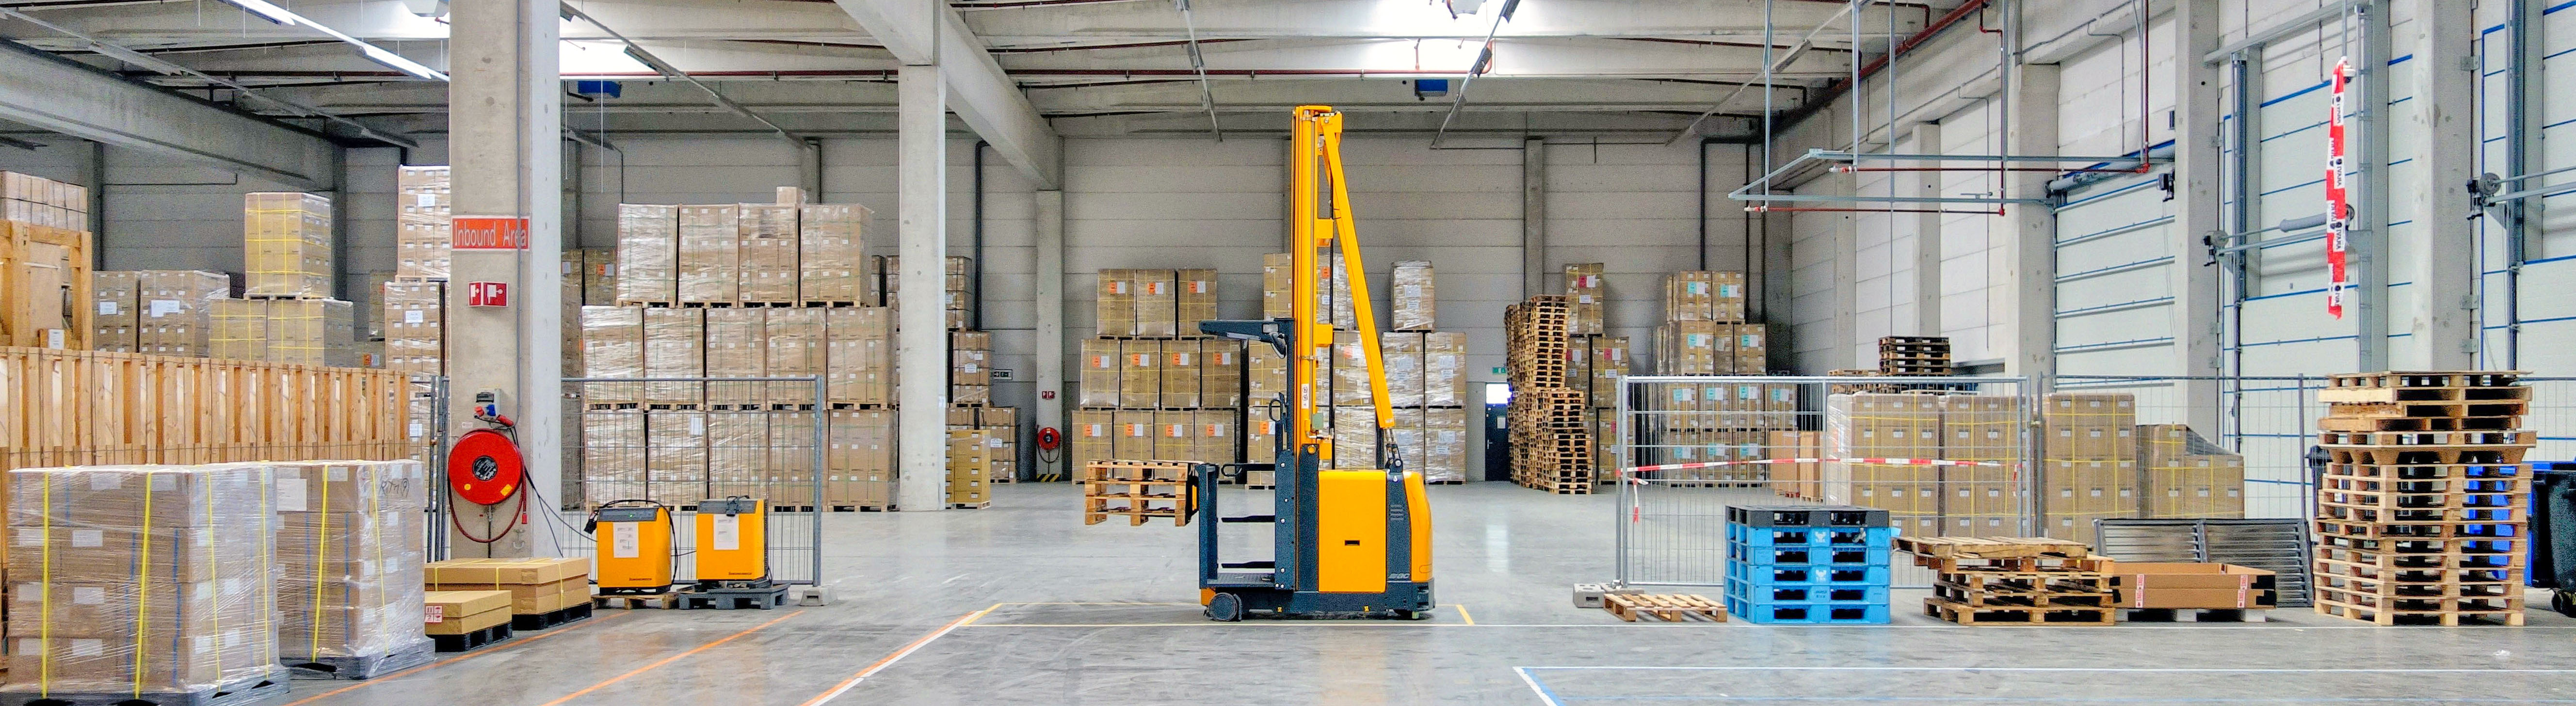 warehouse-exchanges.jpeg